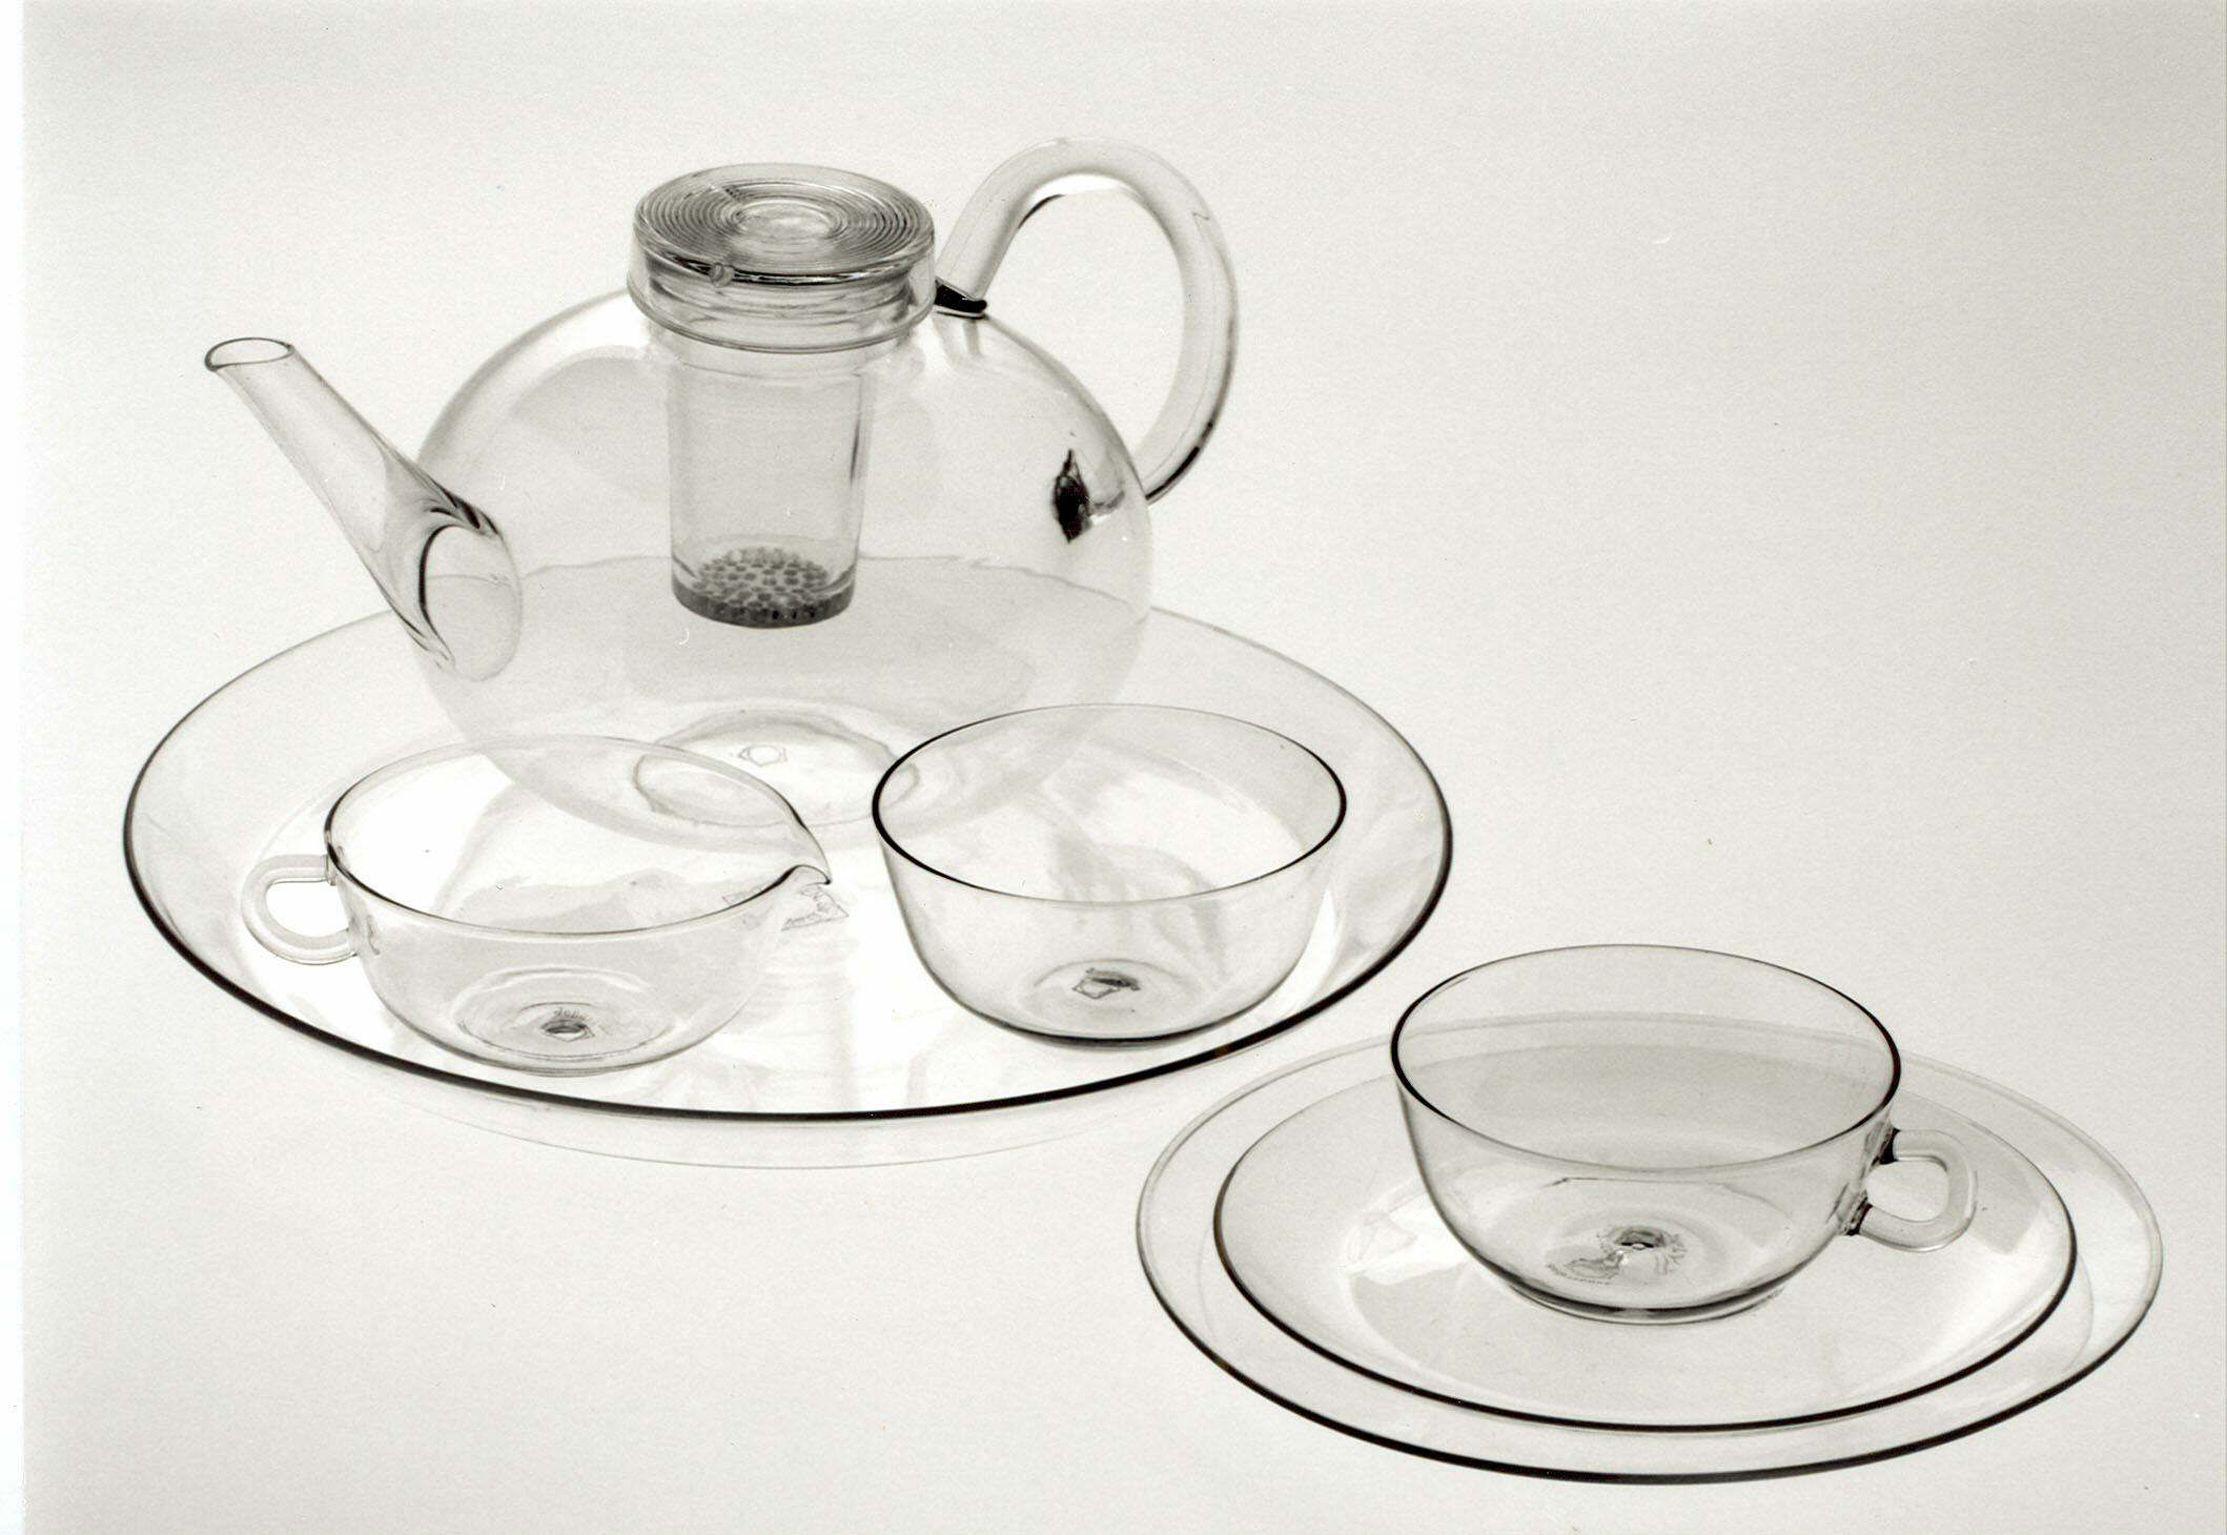 Wilhelm Wagenfeld, Tea Service, 1931. I have a circa 1960s